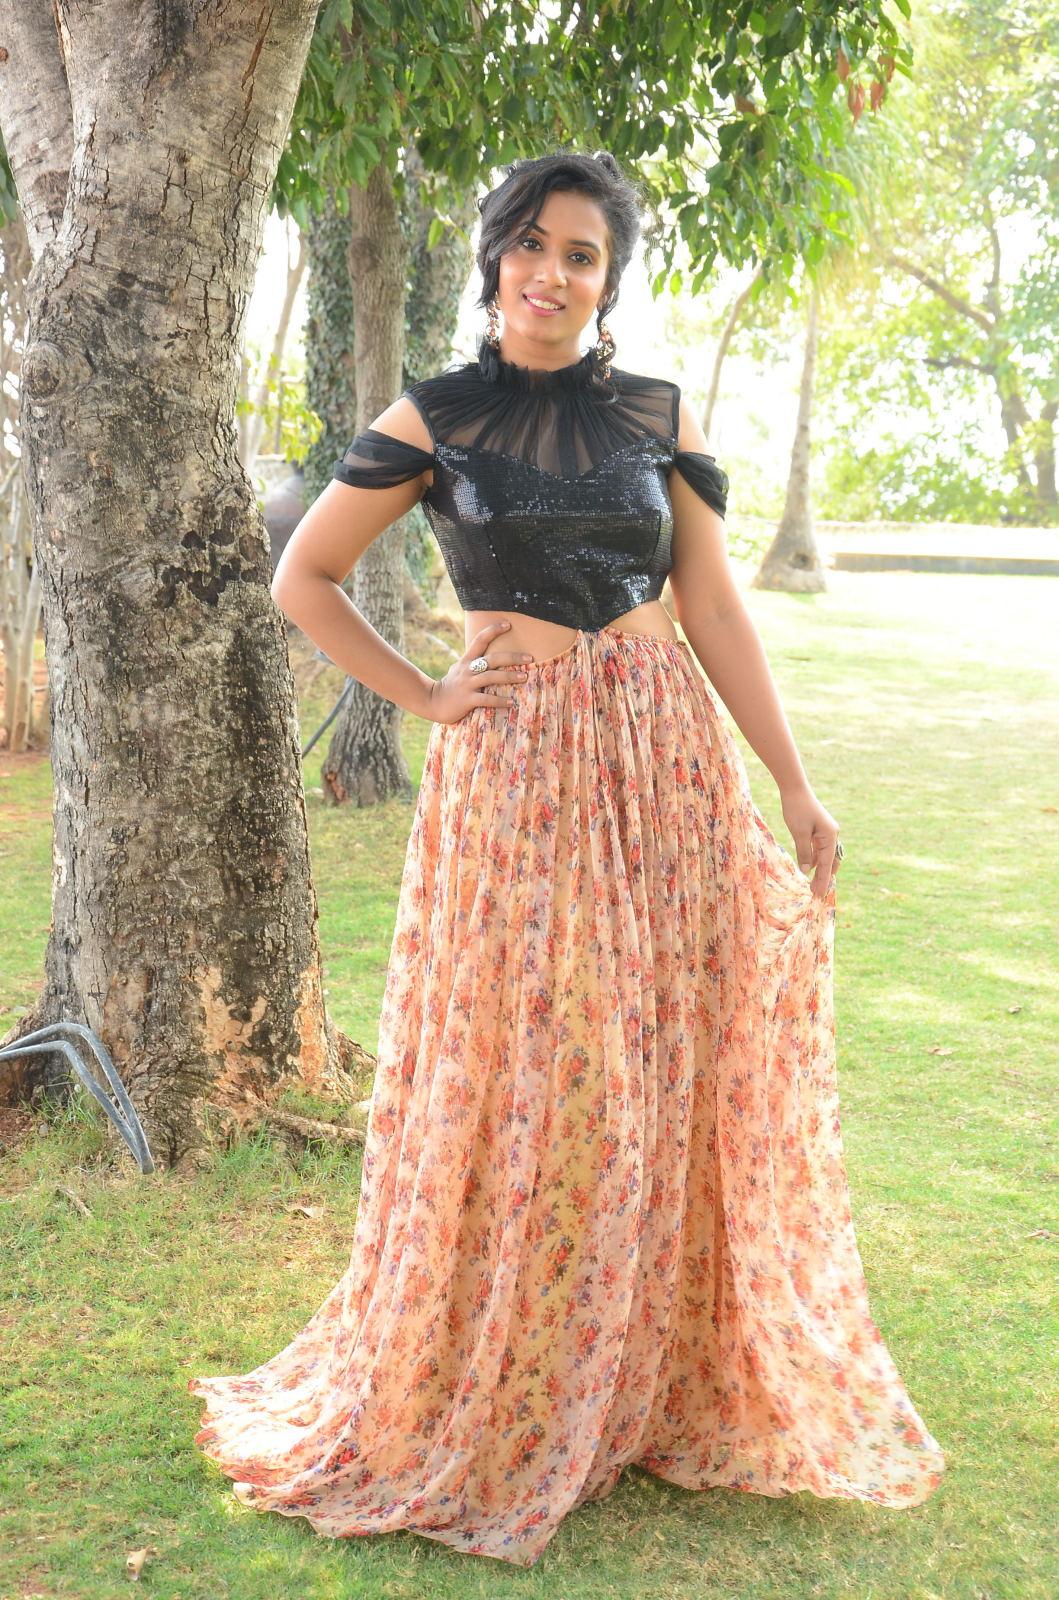 chetana uttej Brand New Photo Stills Of South Actress Chetana Uttej   Tollywood Chetana Uttej 2